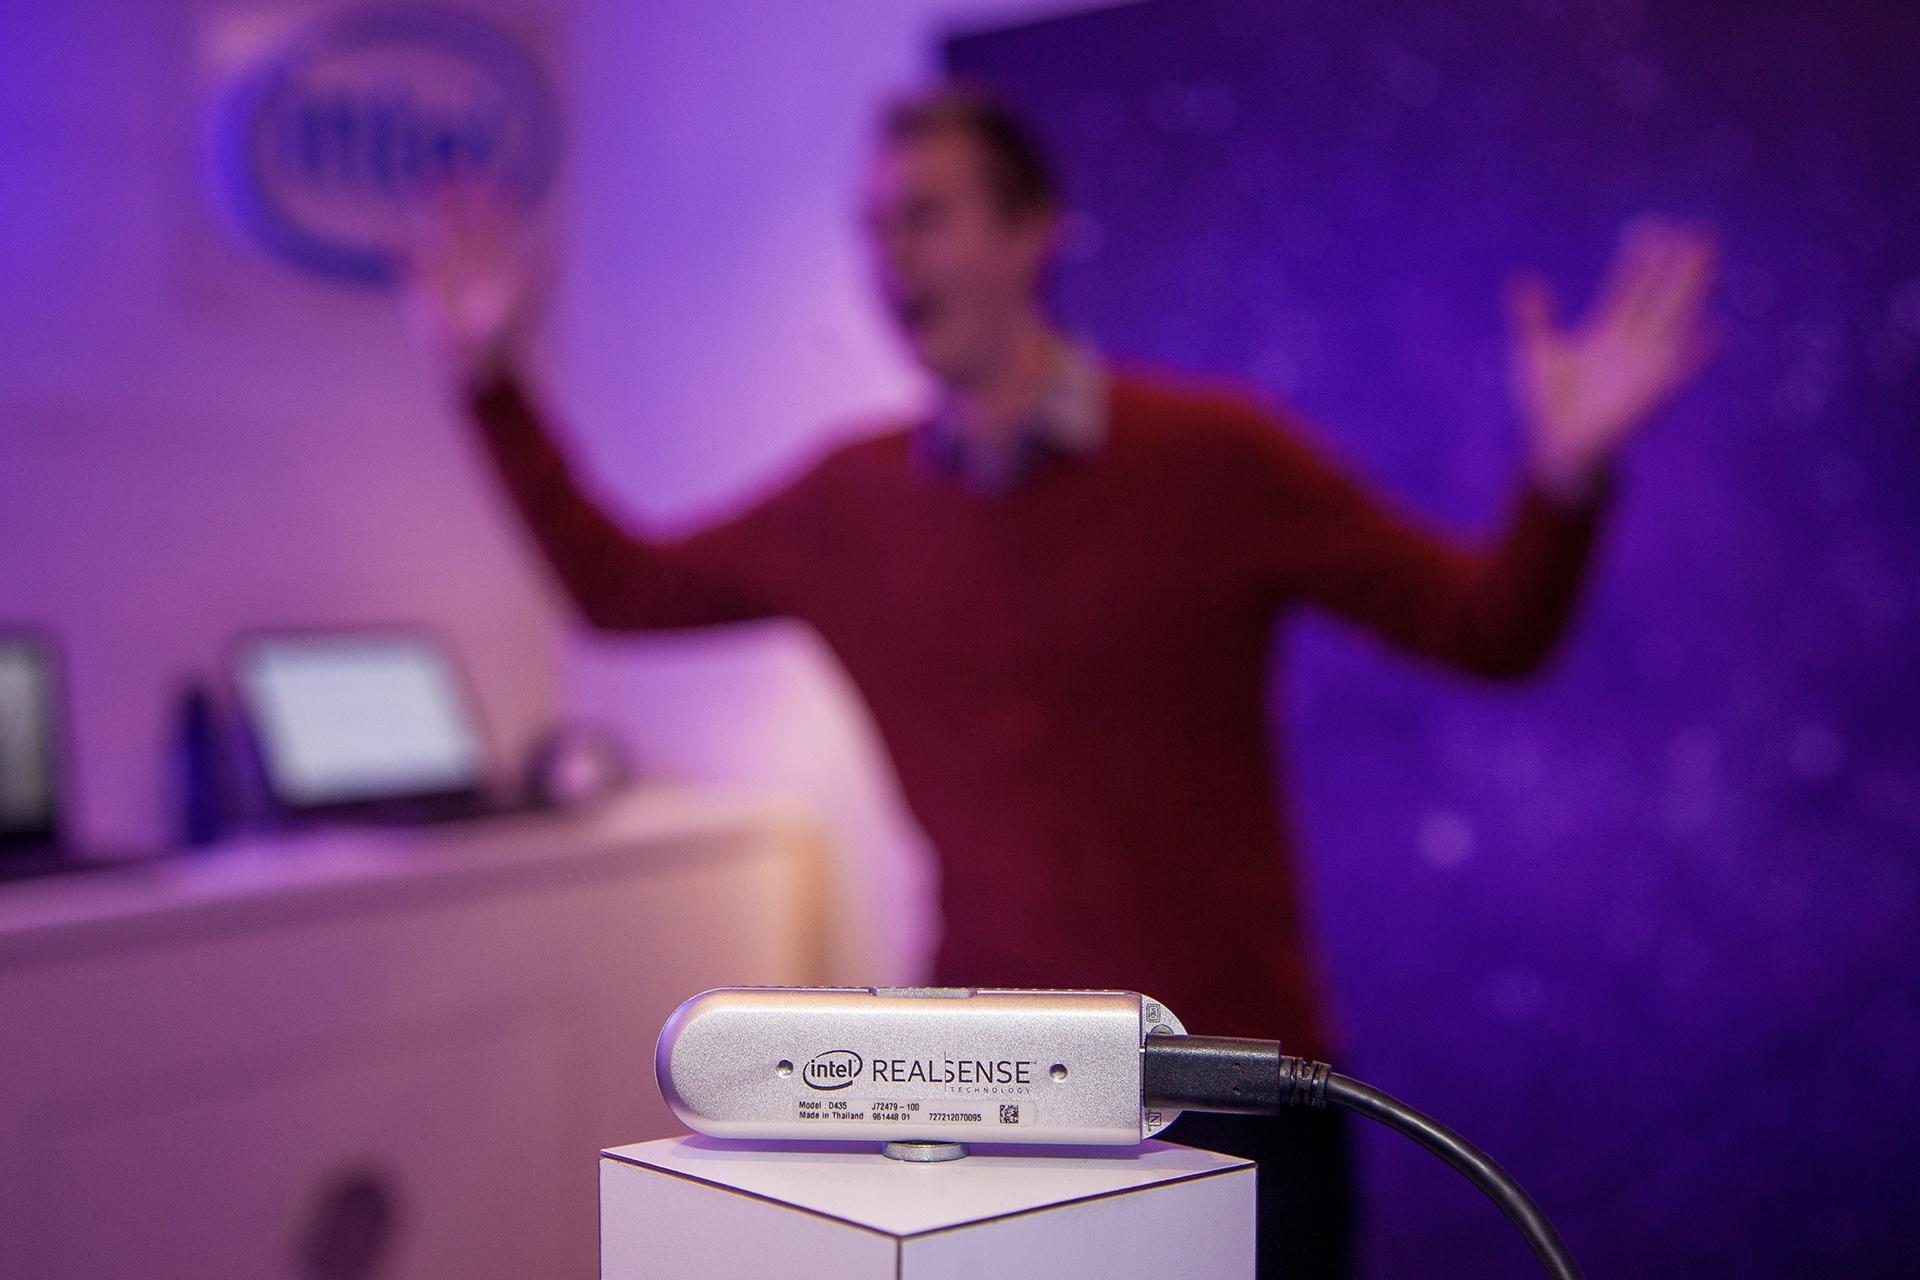 Intel RealSense at Sundance